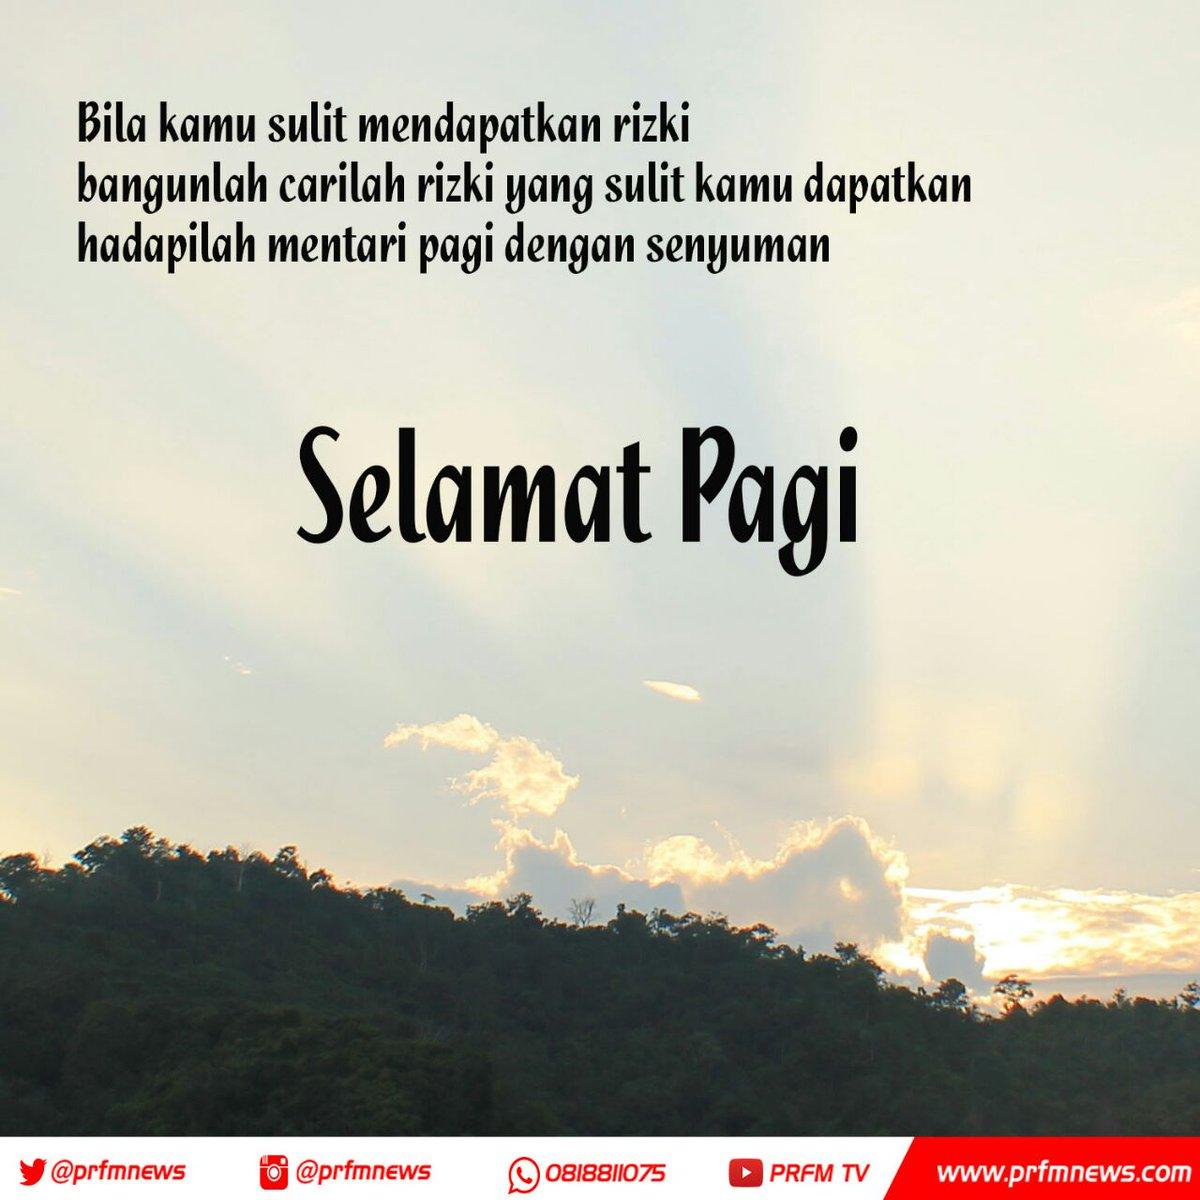 Radio Prfm Bandung On Twitter Selamat Pagi Semangat Pagi